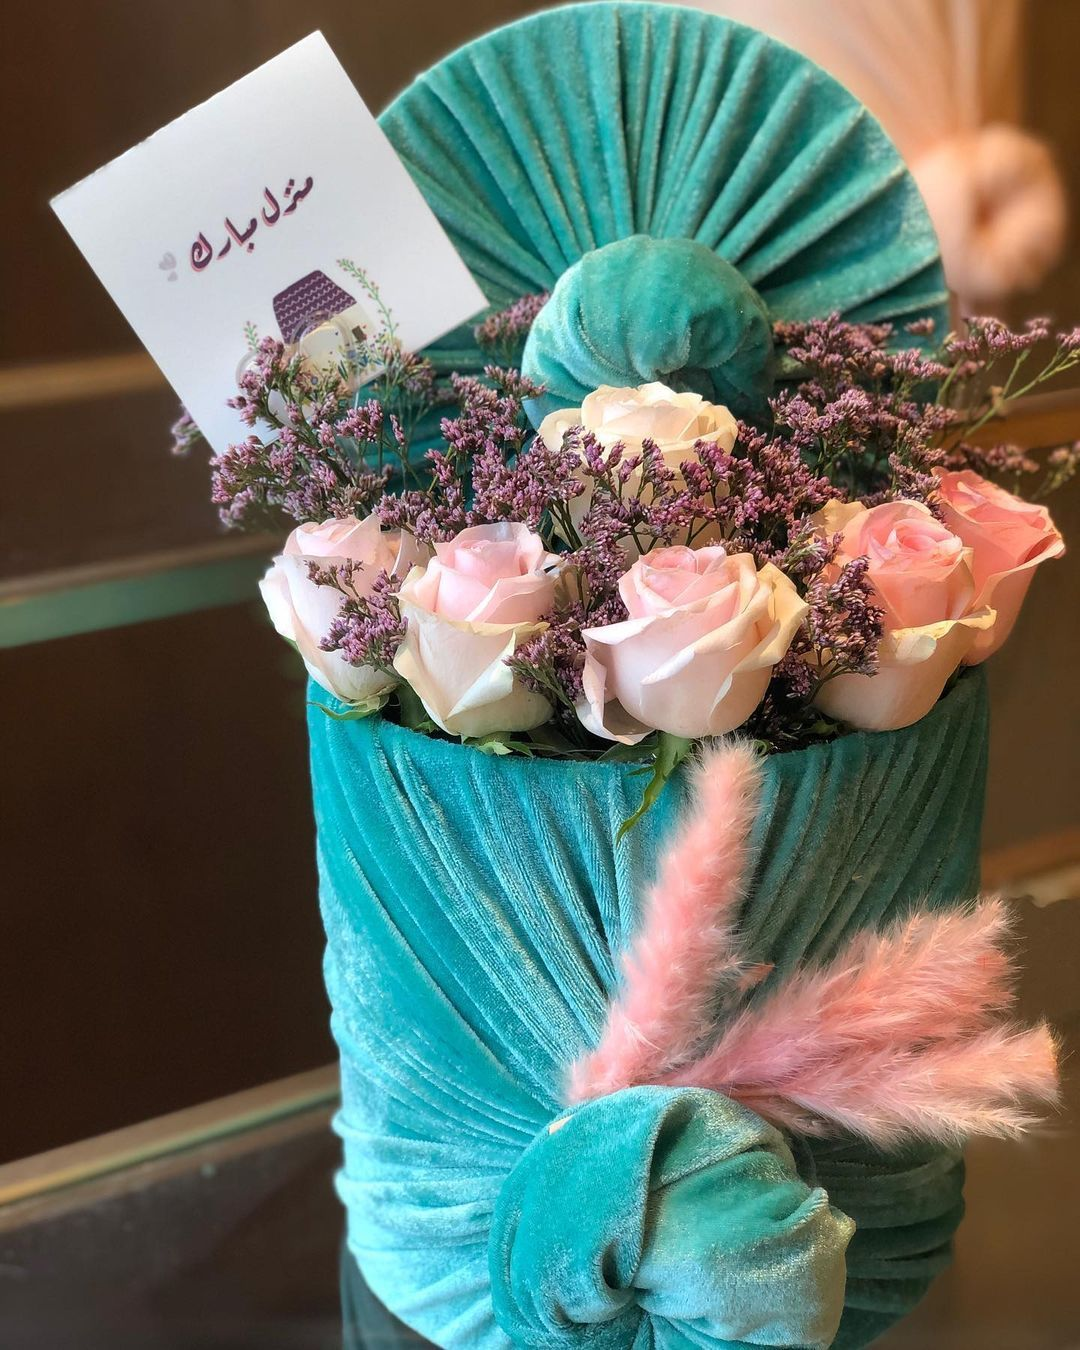 Jasmineland زهور ورود هدايا On Instagram اللون جميل جدا ماشاء الله ويناسب هدية مولود او مولوده مع تغريسه متوفر الان In 2021 Diaper Cake Cabbage Vegetables